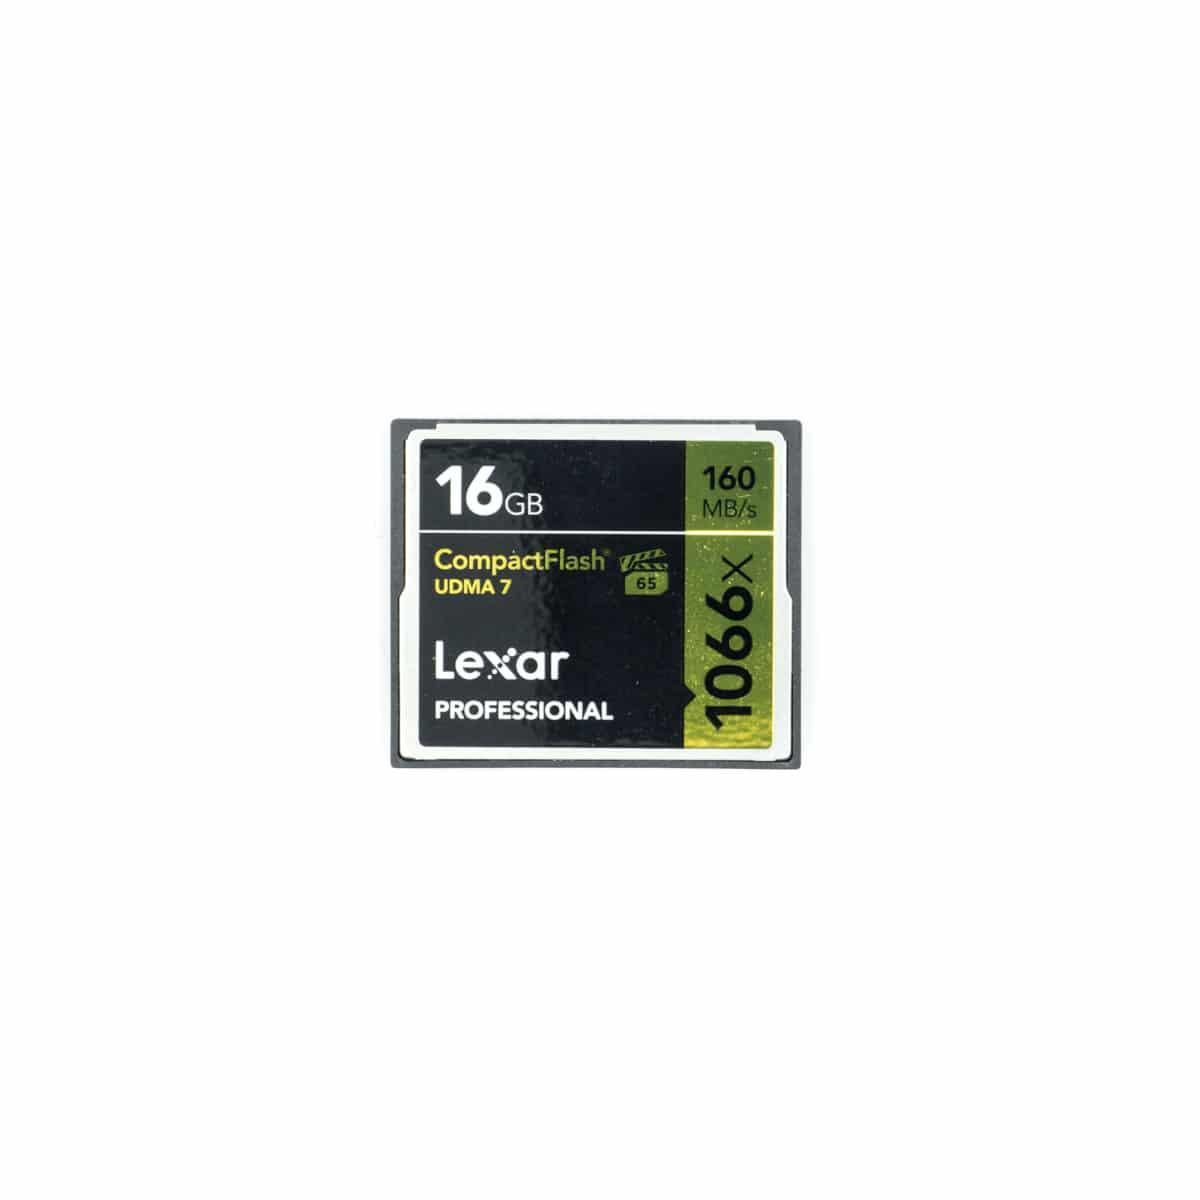 Lexar CF Professional 16GB 160MB/s 1066x – Käytetty